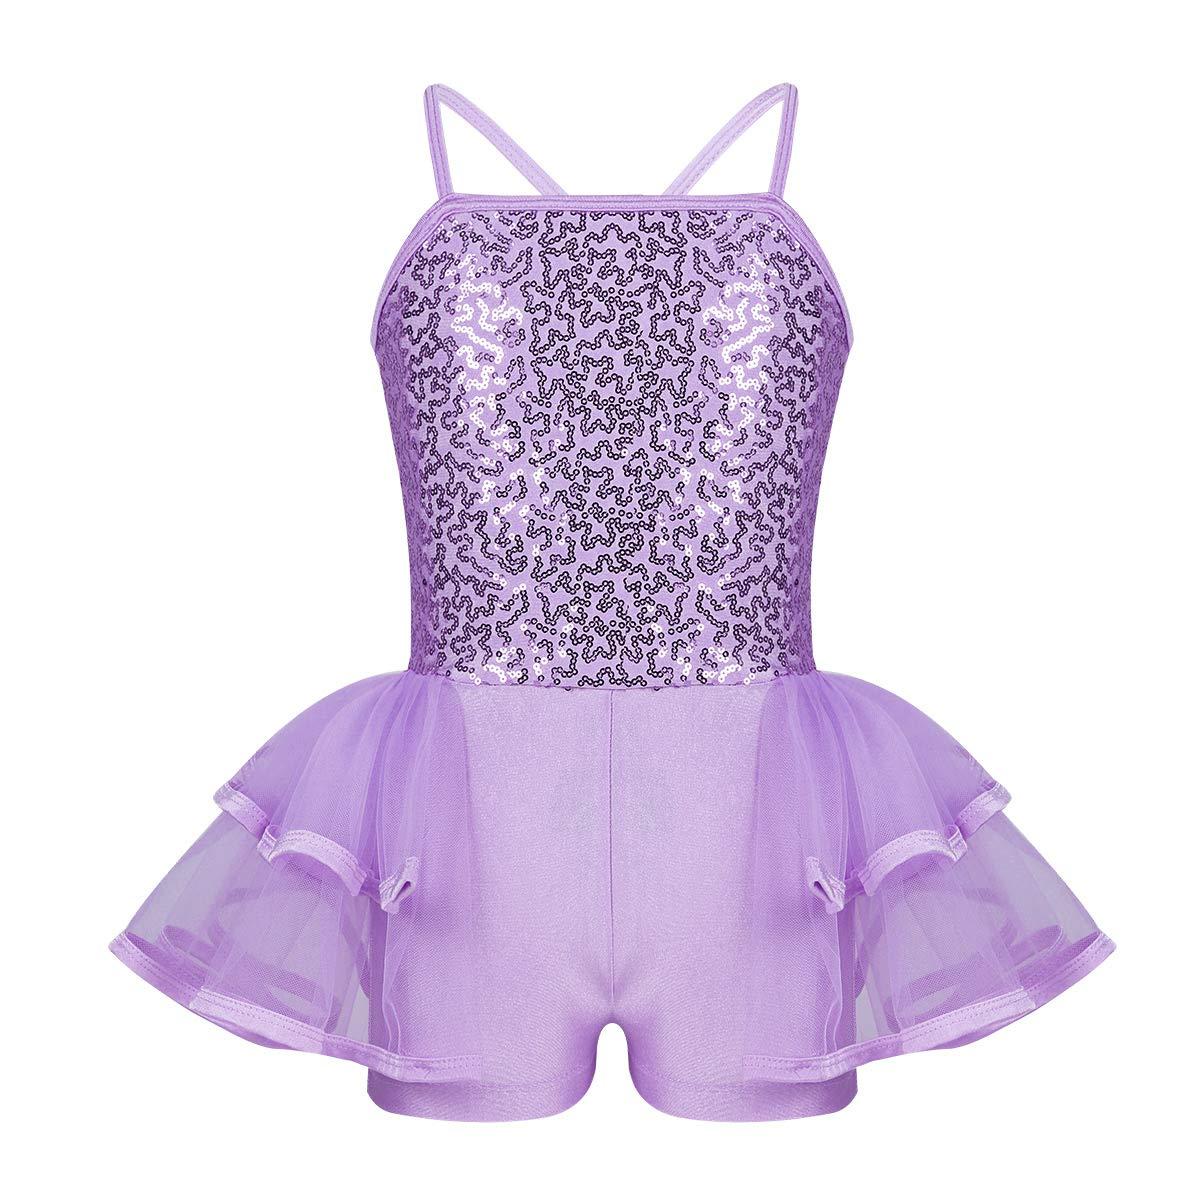 ranrann Girls Ballet Dance Shiny Sequins Criss Cross Back Gymnastic Leotard Tiered Mesh Tutu Dress